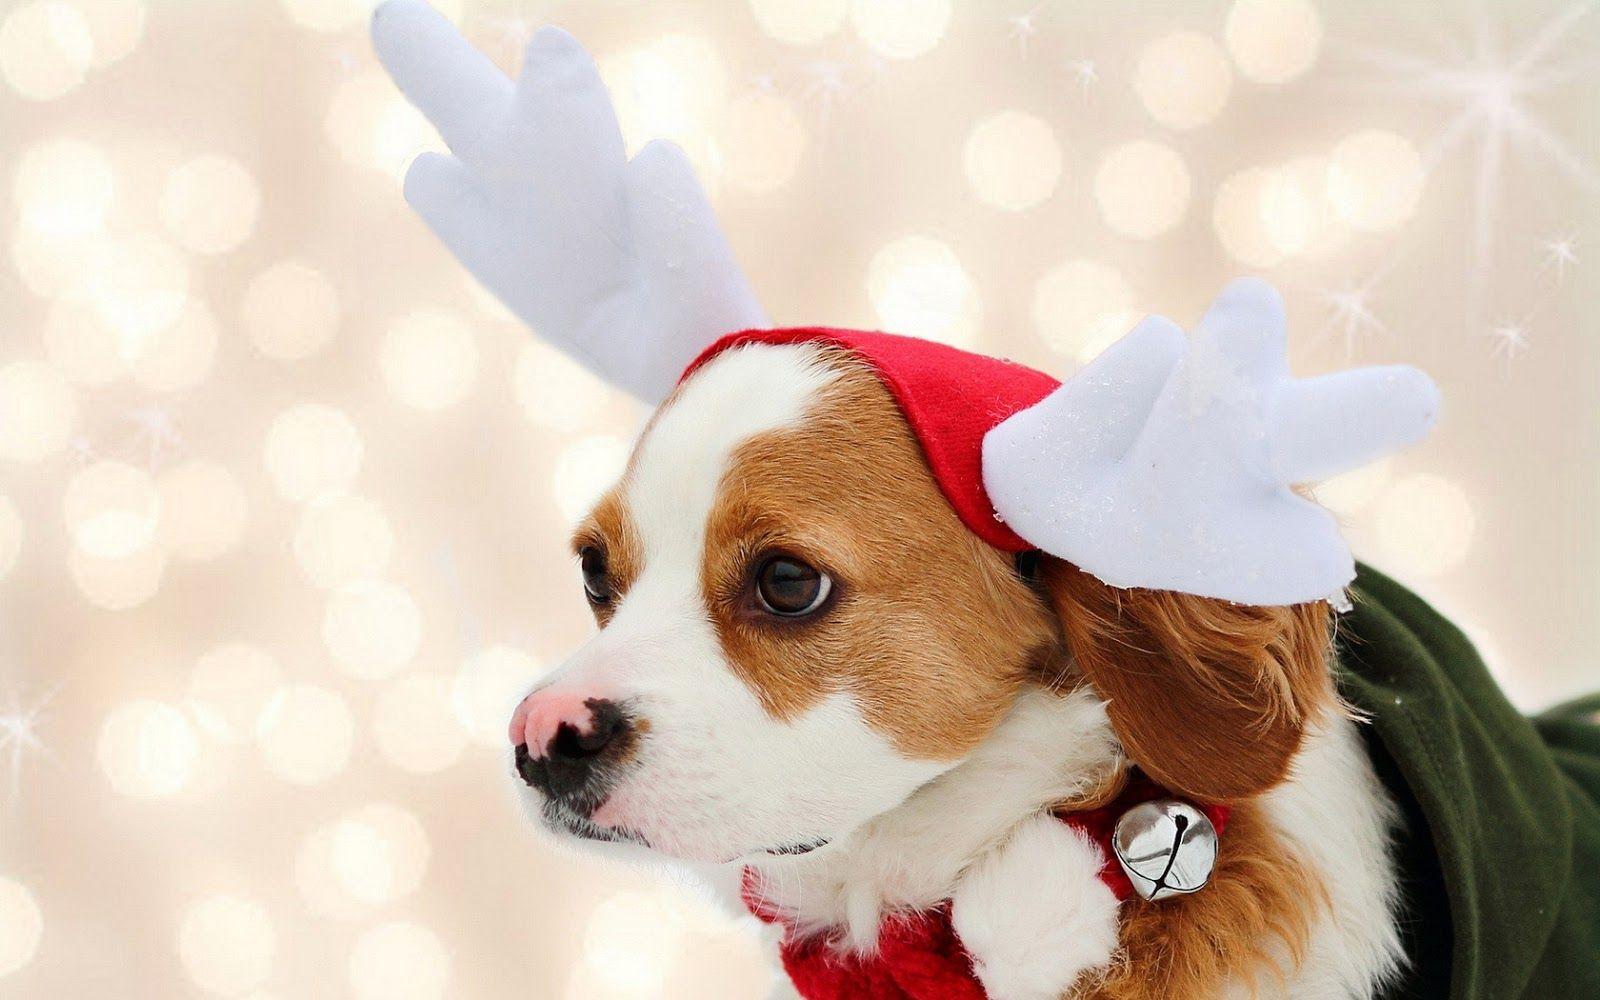 Baby Dog Wearing Christmas Cap Wallpaper Animals